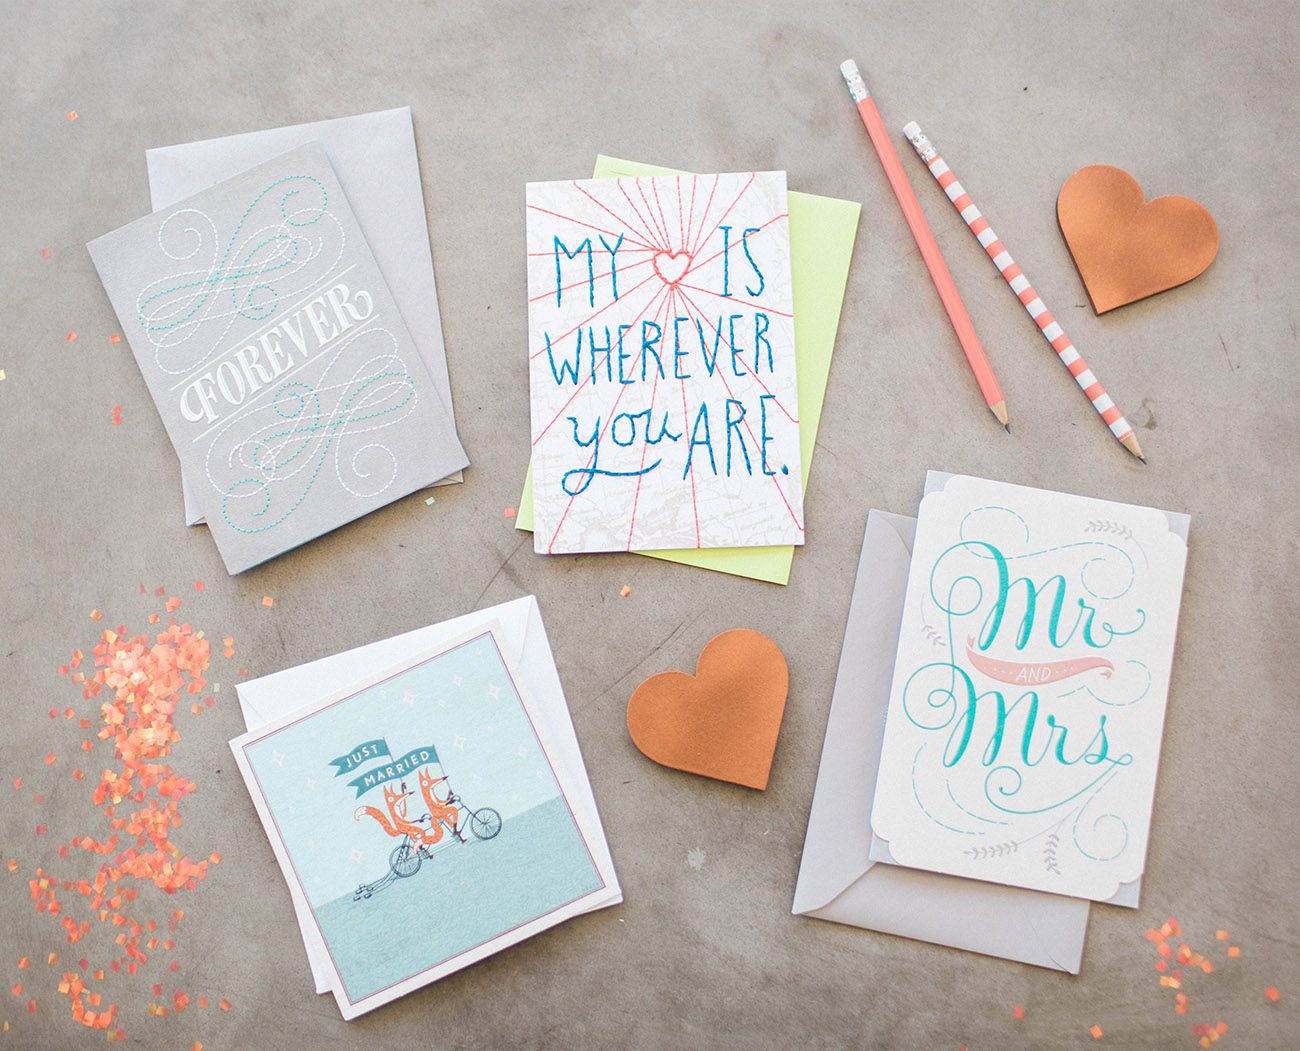 Hallmark Cards for Wedding Events